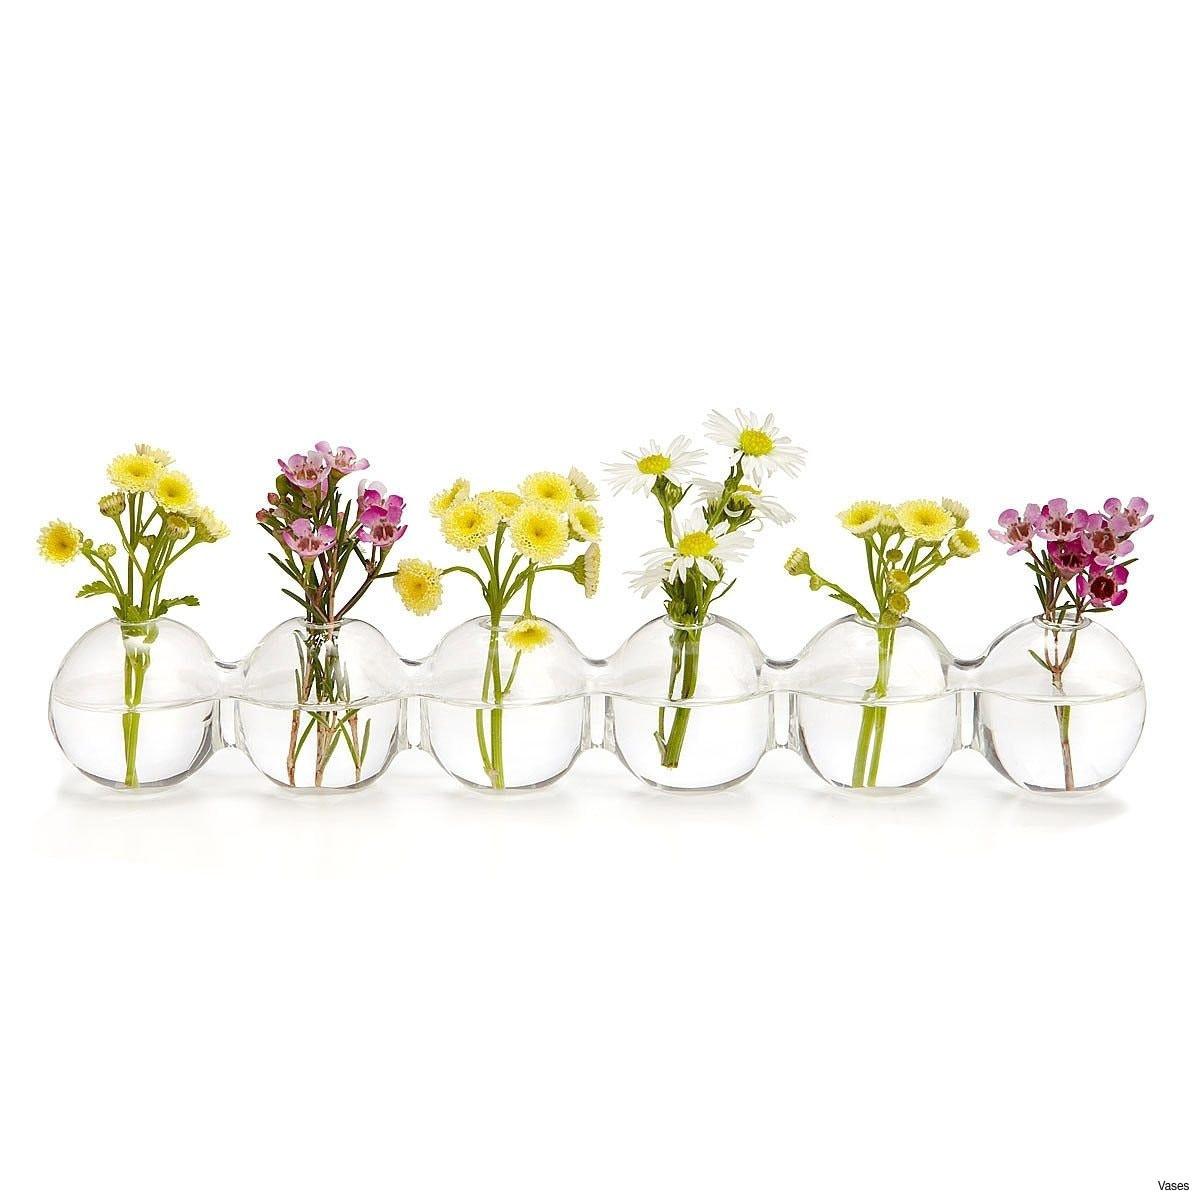 Small Vintage Vases Bulk Of Bulk Bud Vase Photos Mini Vases Bulk and Beautiful Bud Vase Will Throughout Bulk Bud Vase Gallery Bud Vase In 28case 29 Glass 29h Vases Small Bulk Case I